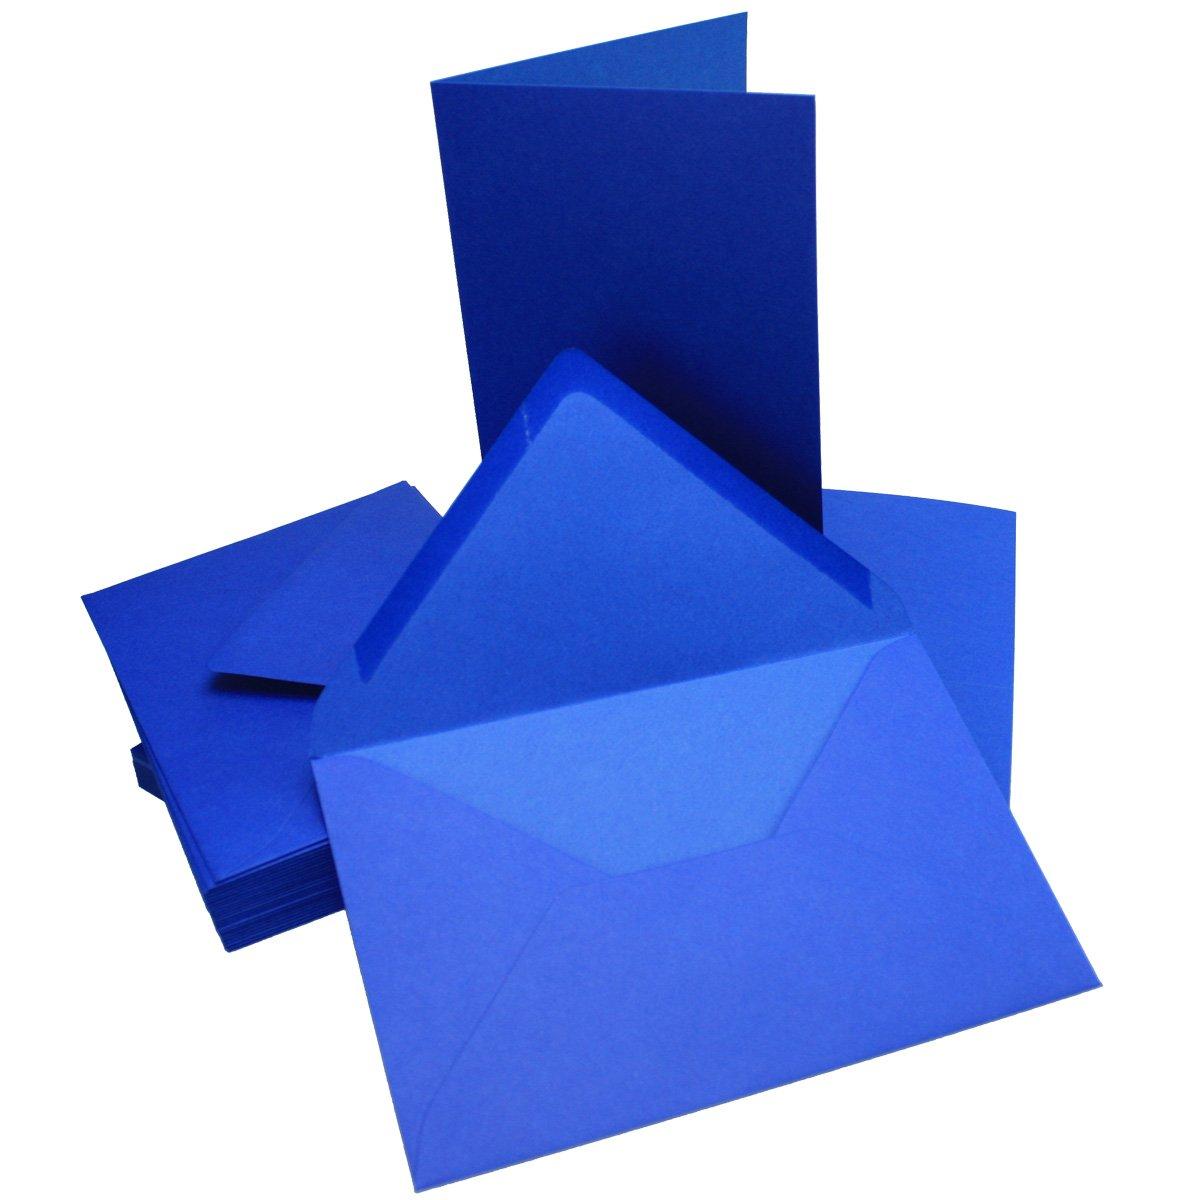 75 Sets - Faltkarten Hellgrau - Din A5  Umschläge Umschläge Umschläge Din C5 - Premium Qualität - Sehr formstabil - Qualitätsmarke  NEUSER FarbenFroh B07BSGTQ4G | Billig  d183b7